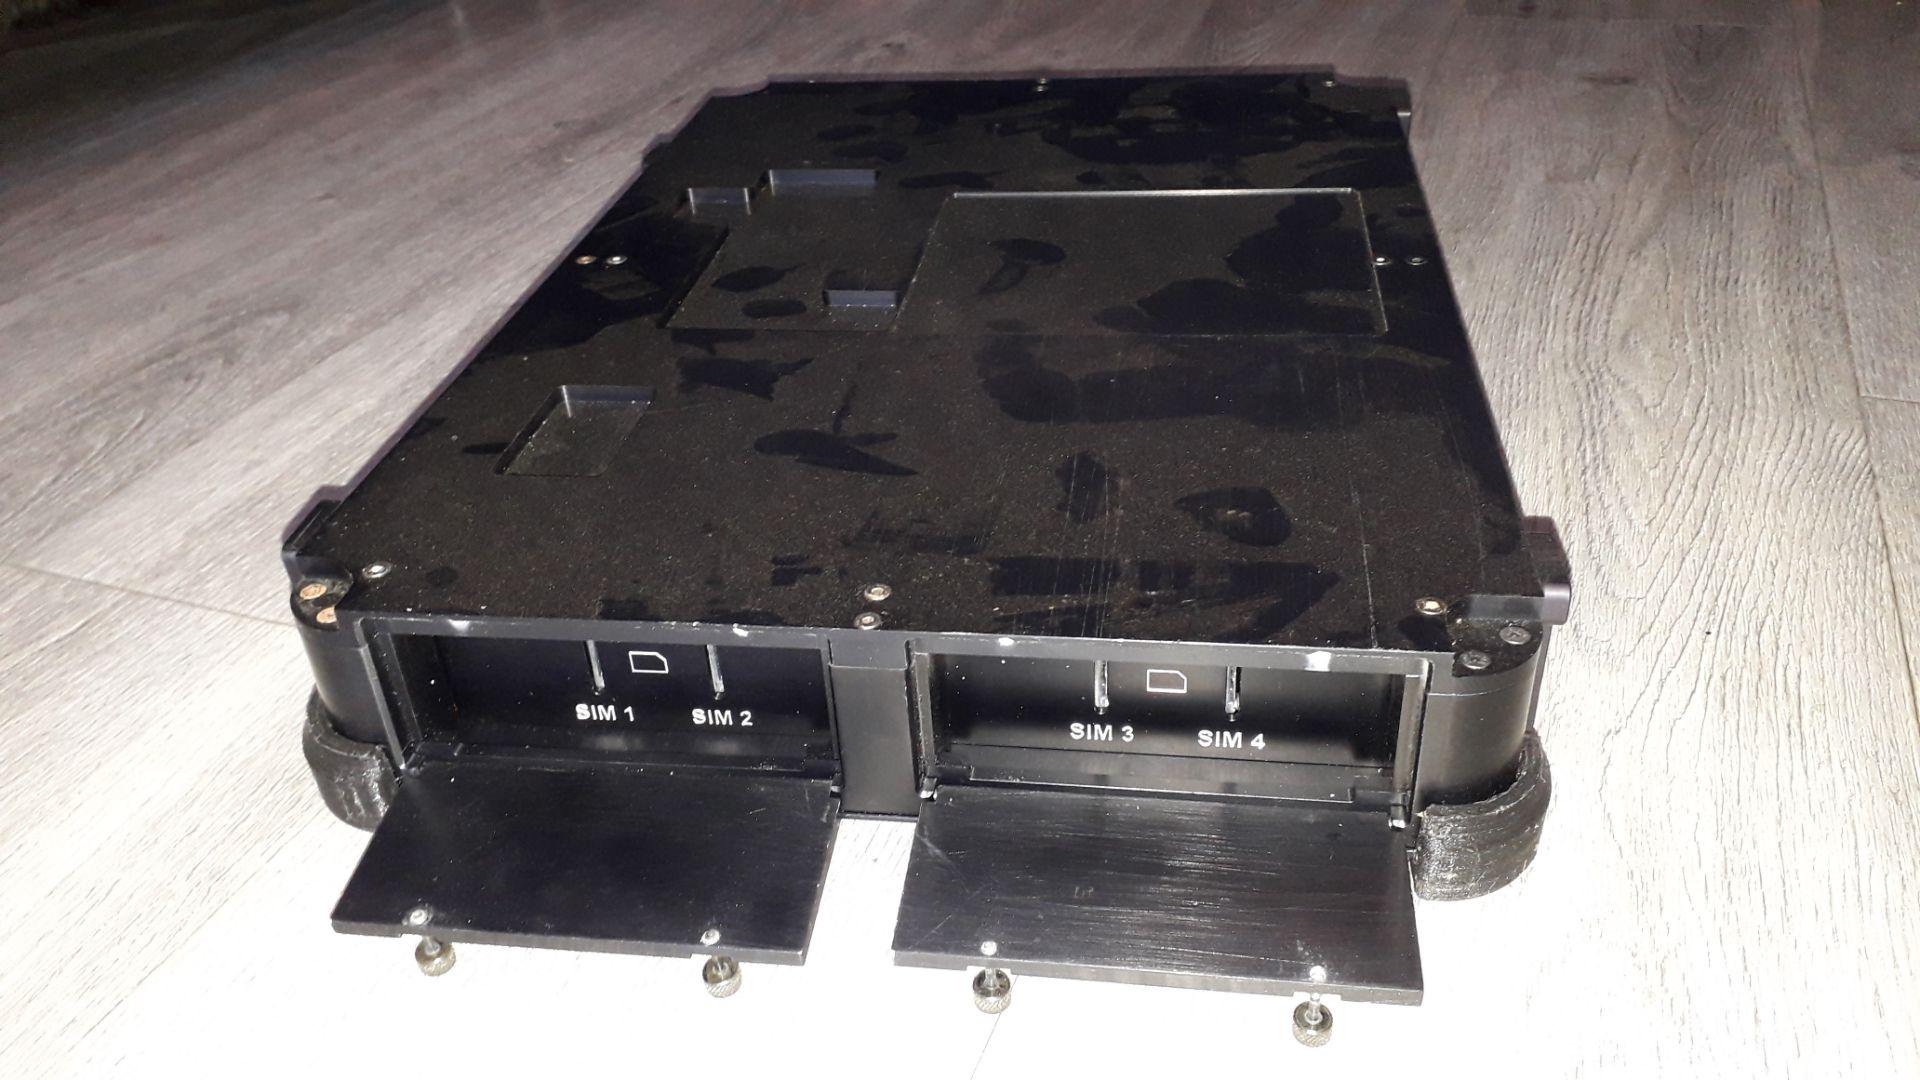 Unbranded Docking Bay for Getac X500 Ultra Rugged - Image 3 of 7